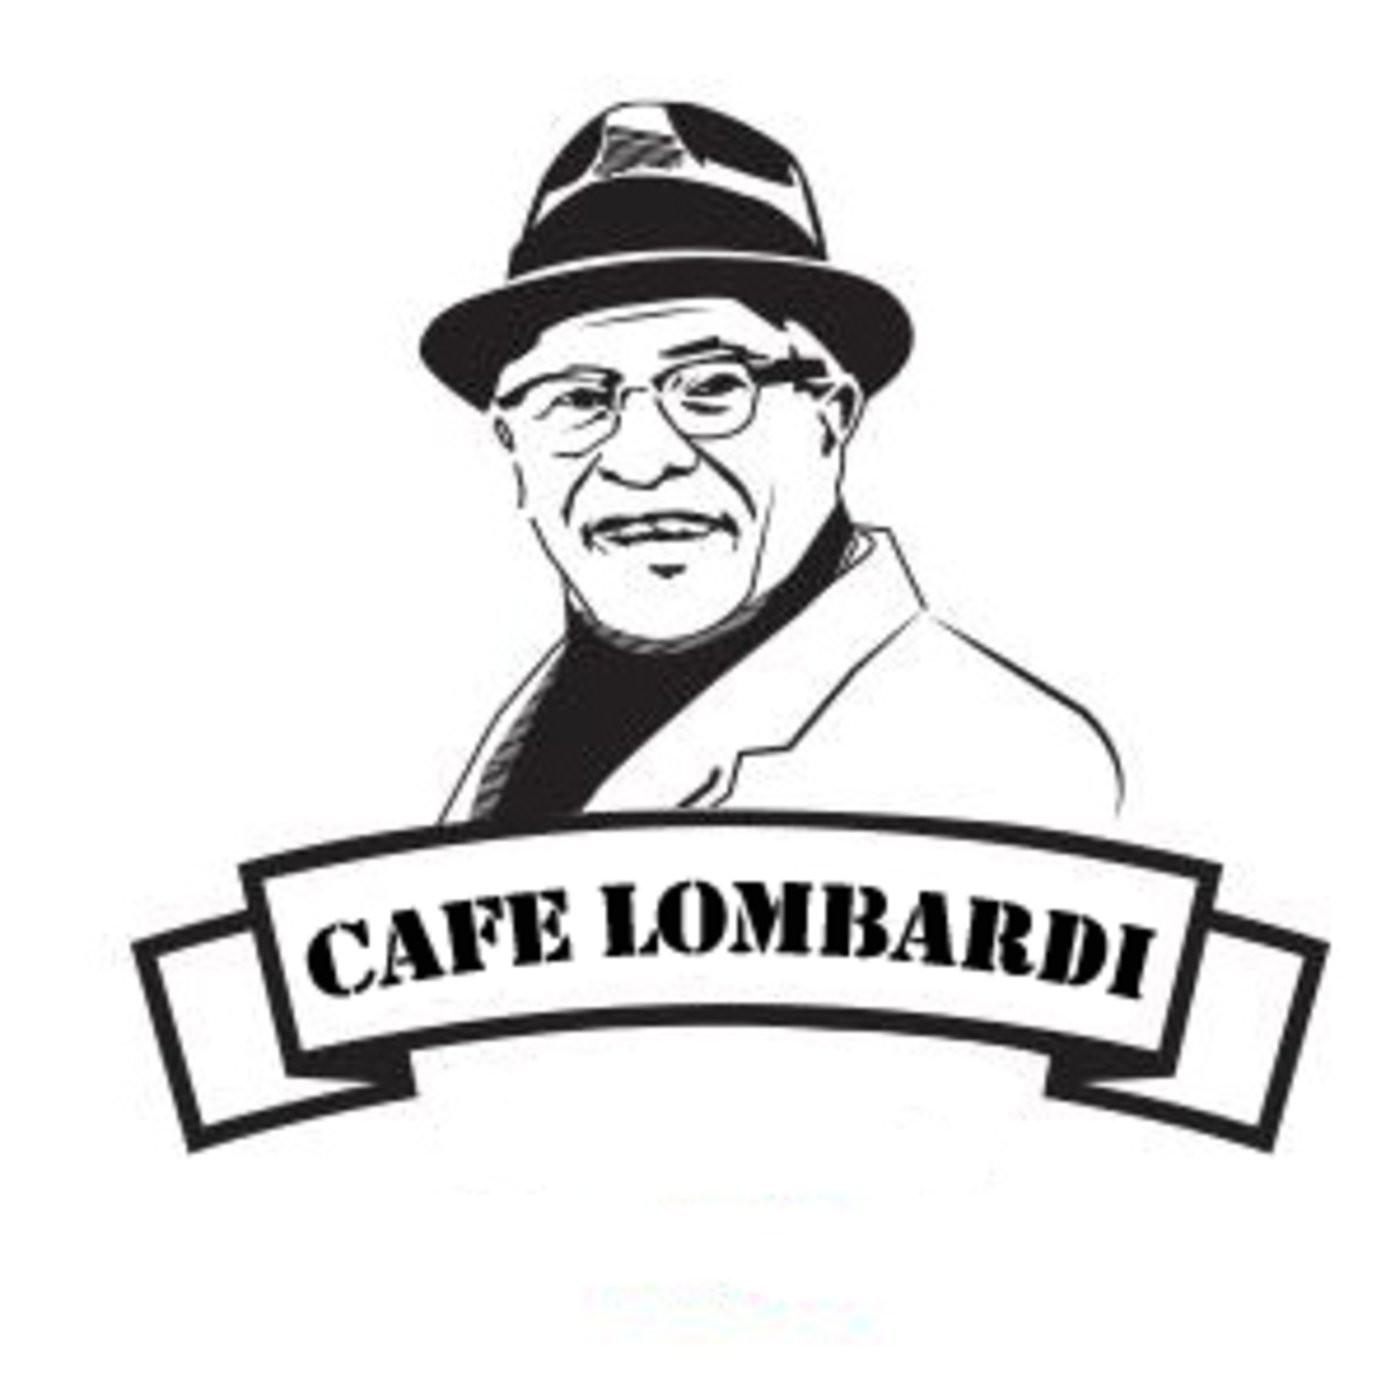 <![CDATA[Cafe Lombardi]]>